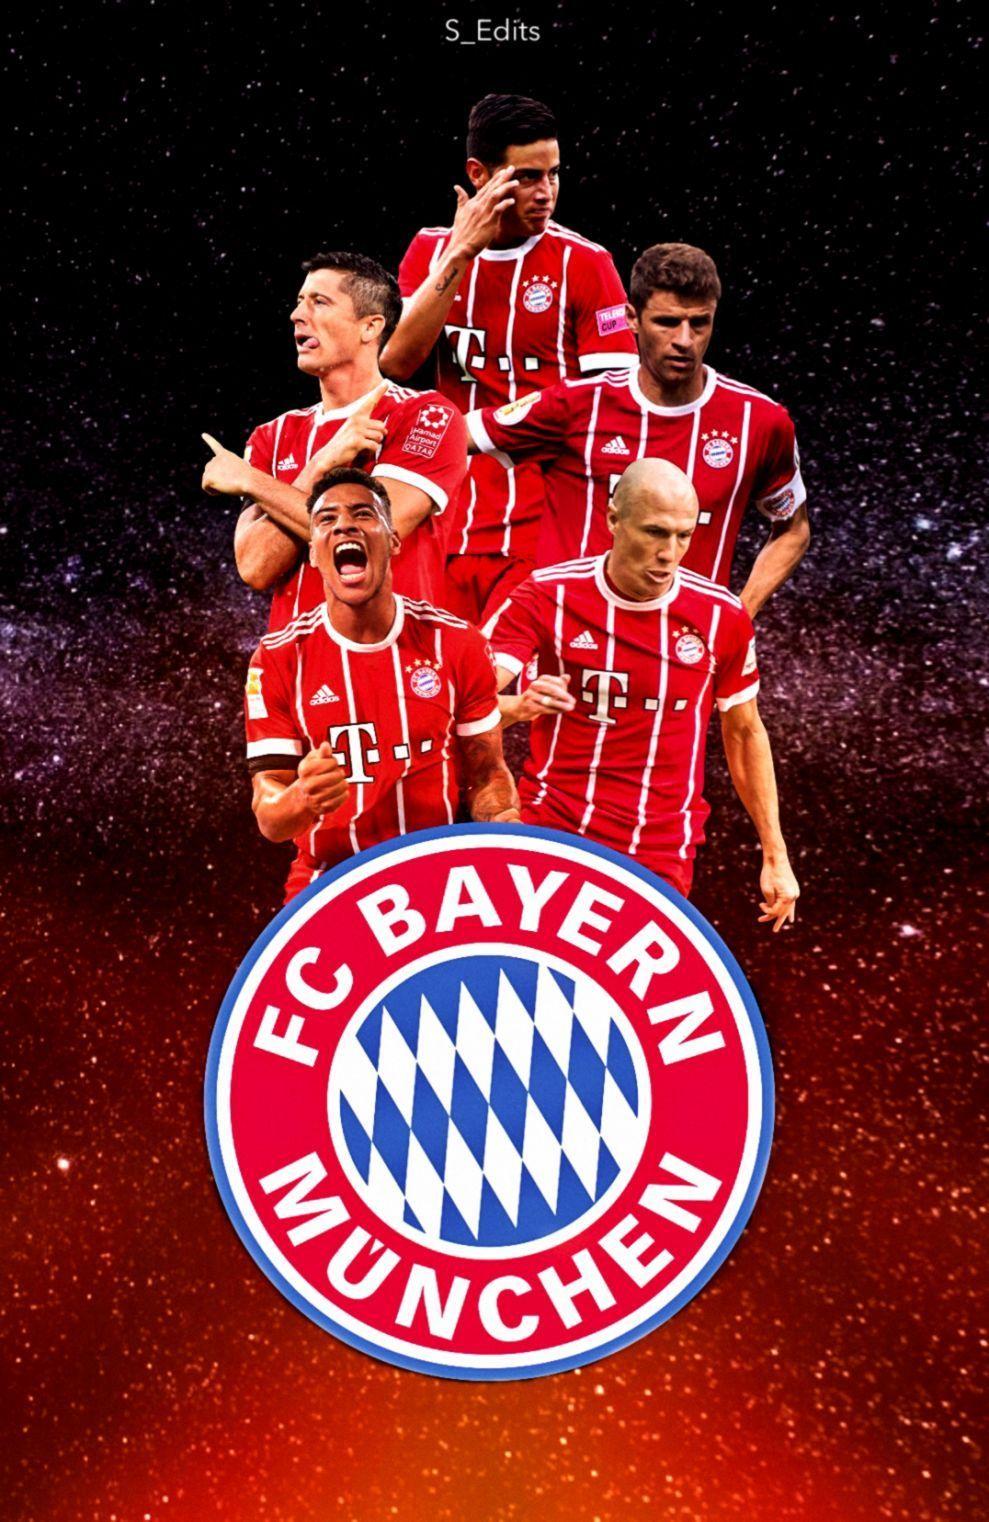 Bayern Munich 2020 Wallpapers Wallpaper Cave